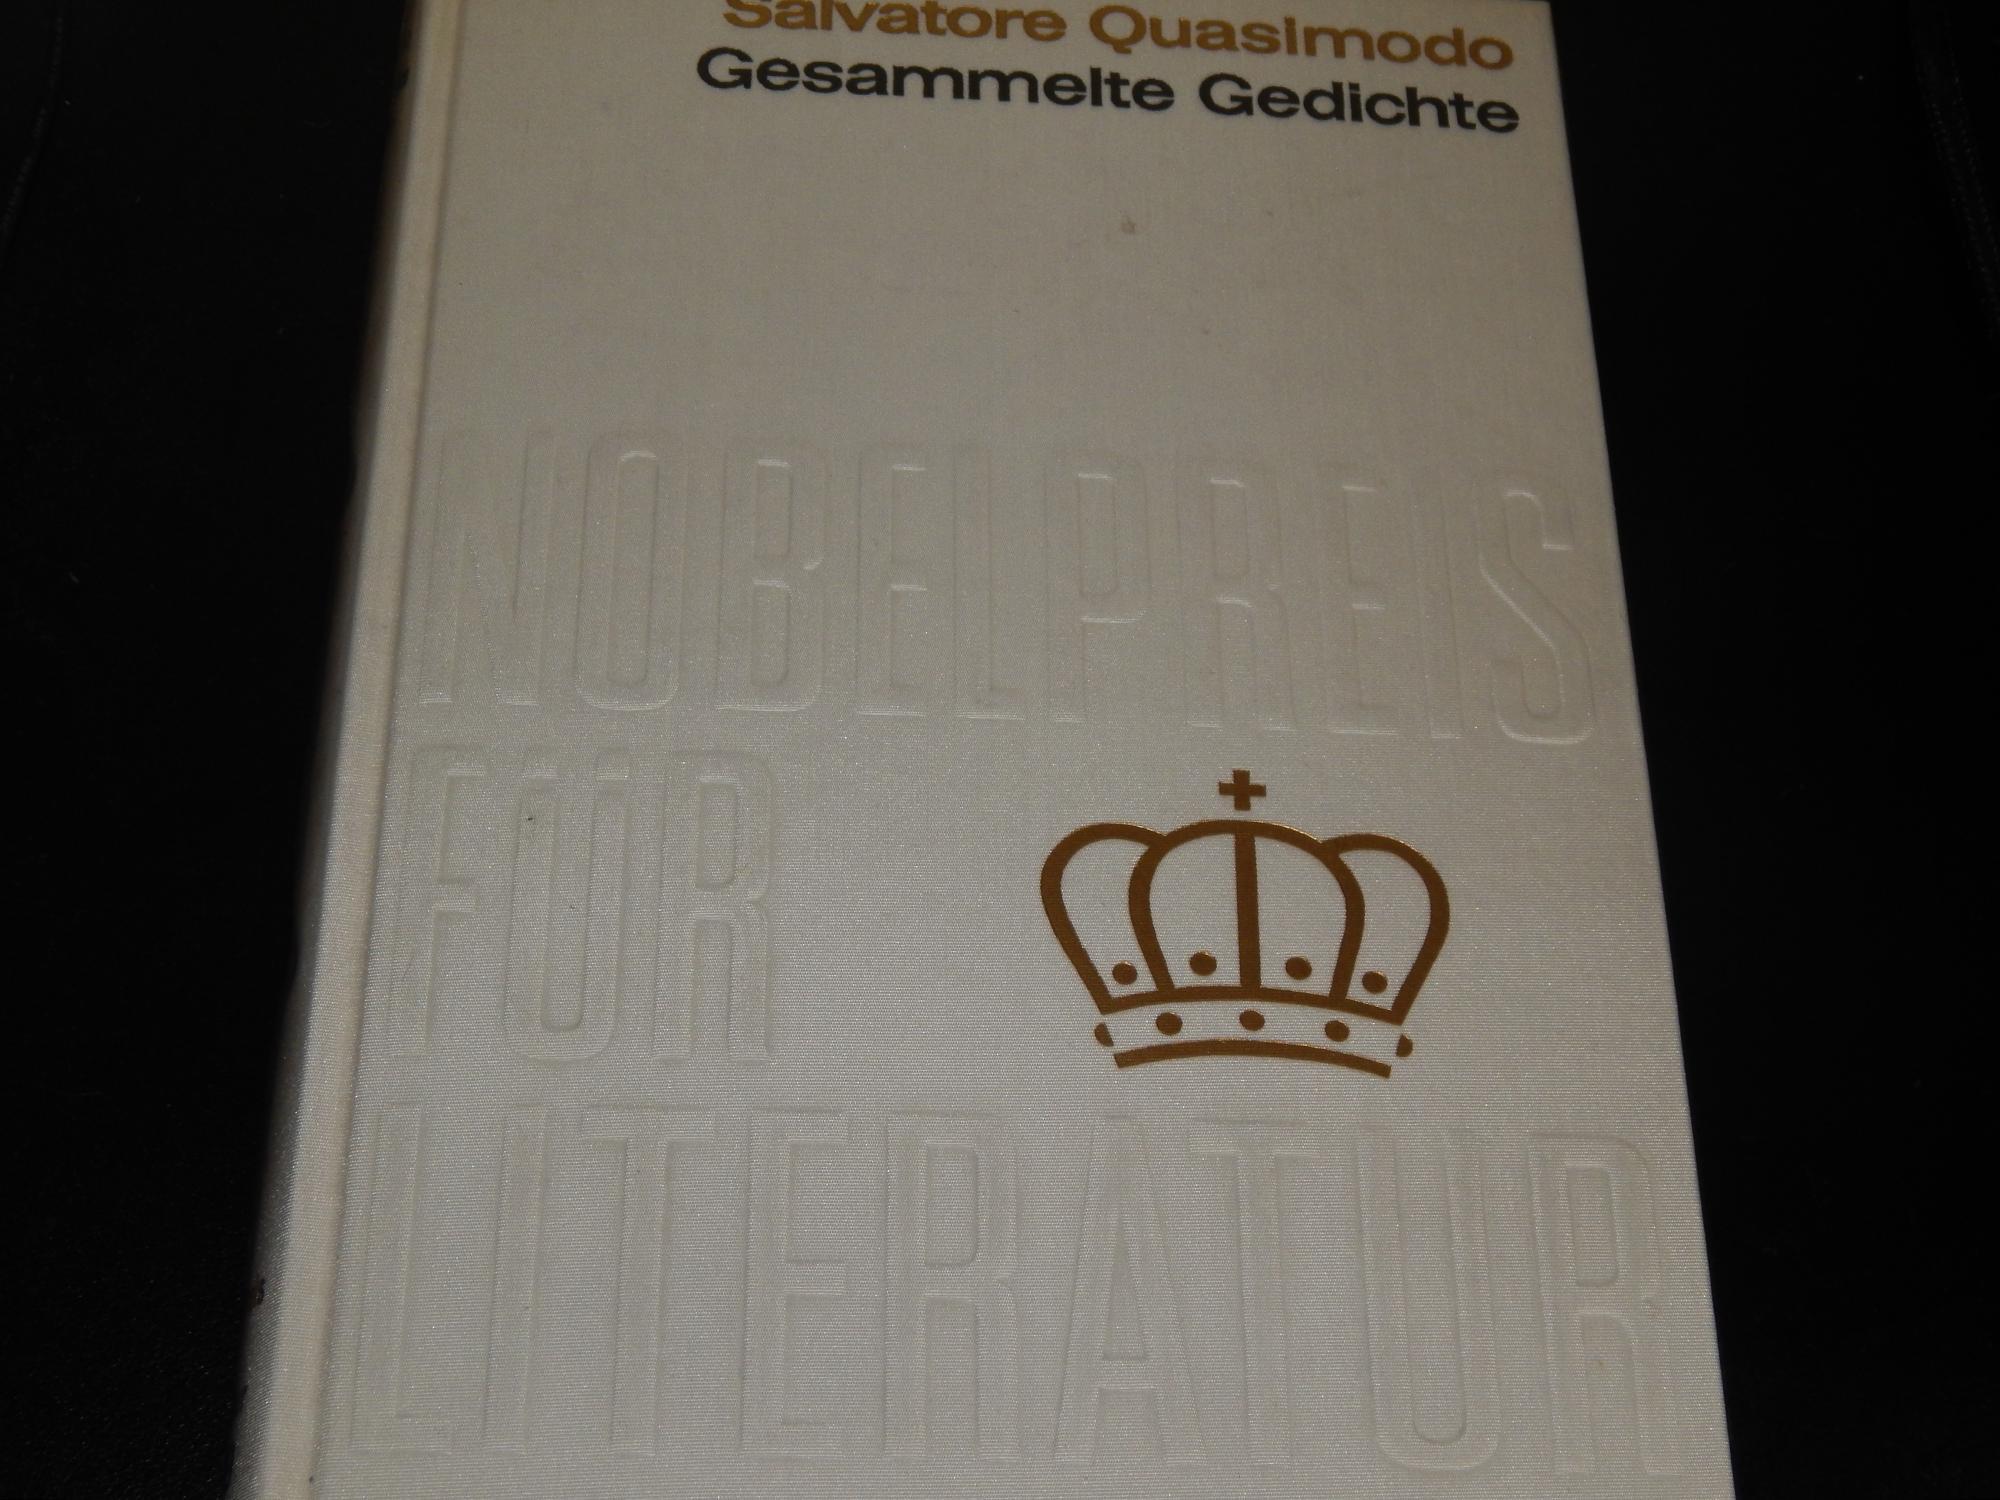 Gesammelte Gedichte Nobelpreis 1959 Italien: Quasimodo, Salvatore